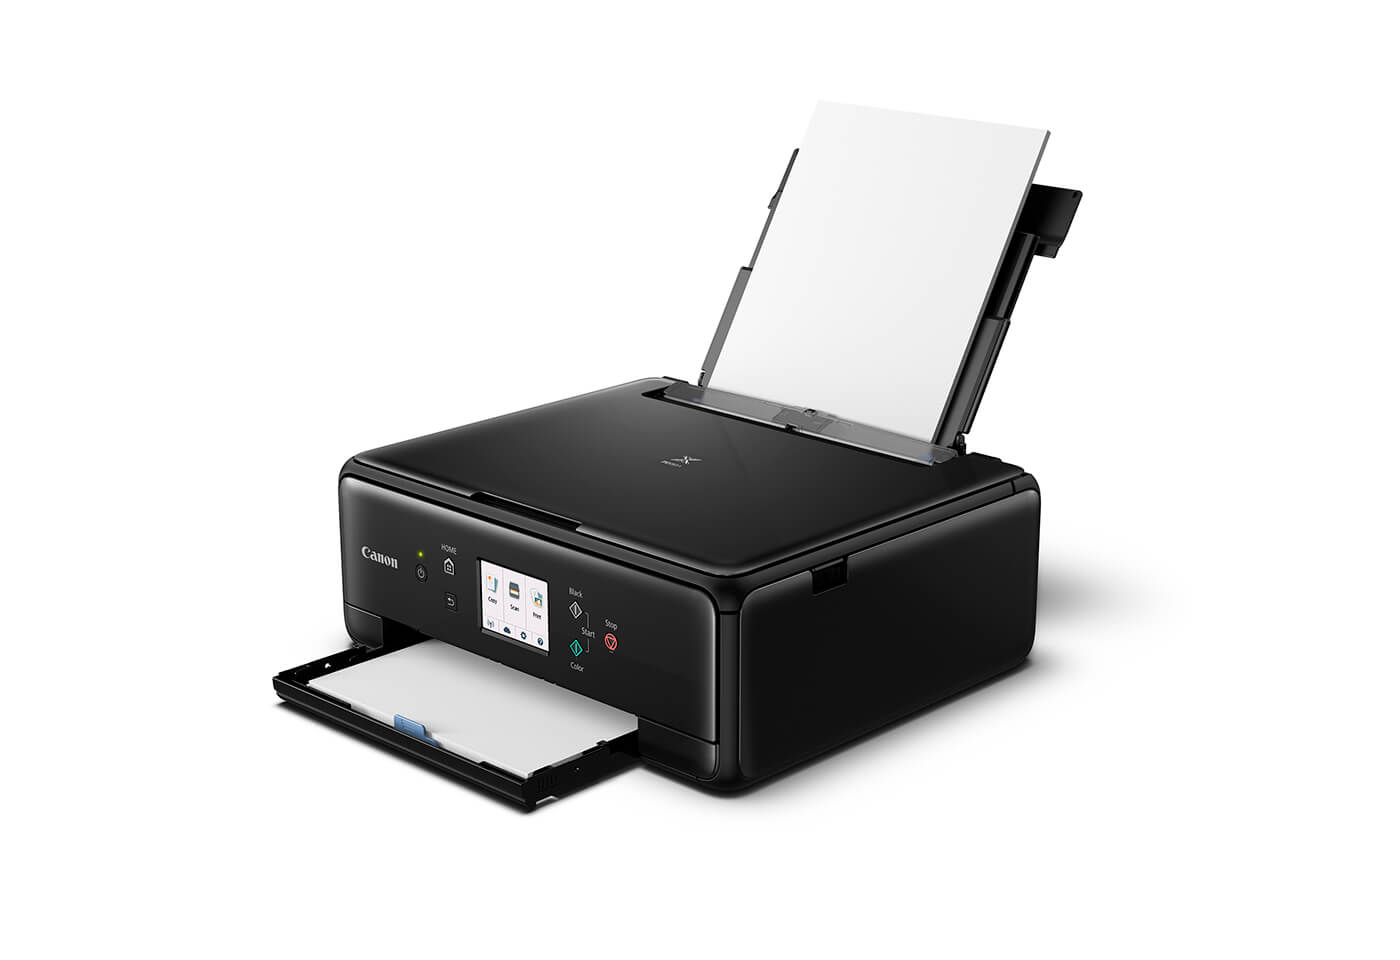 ts6160-dual-paper.ashx (1400�960)